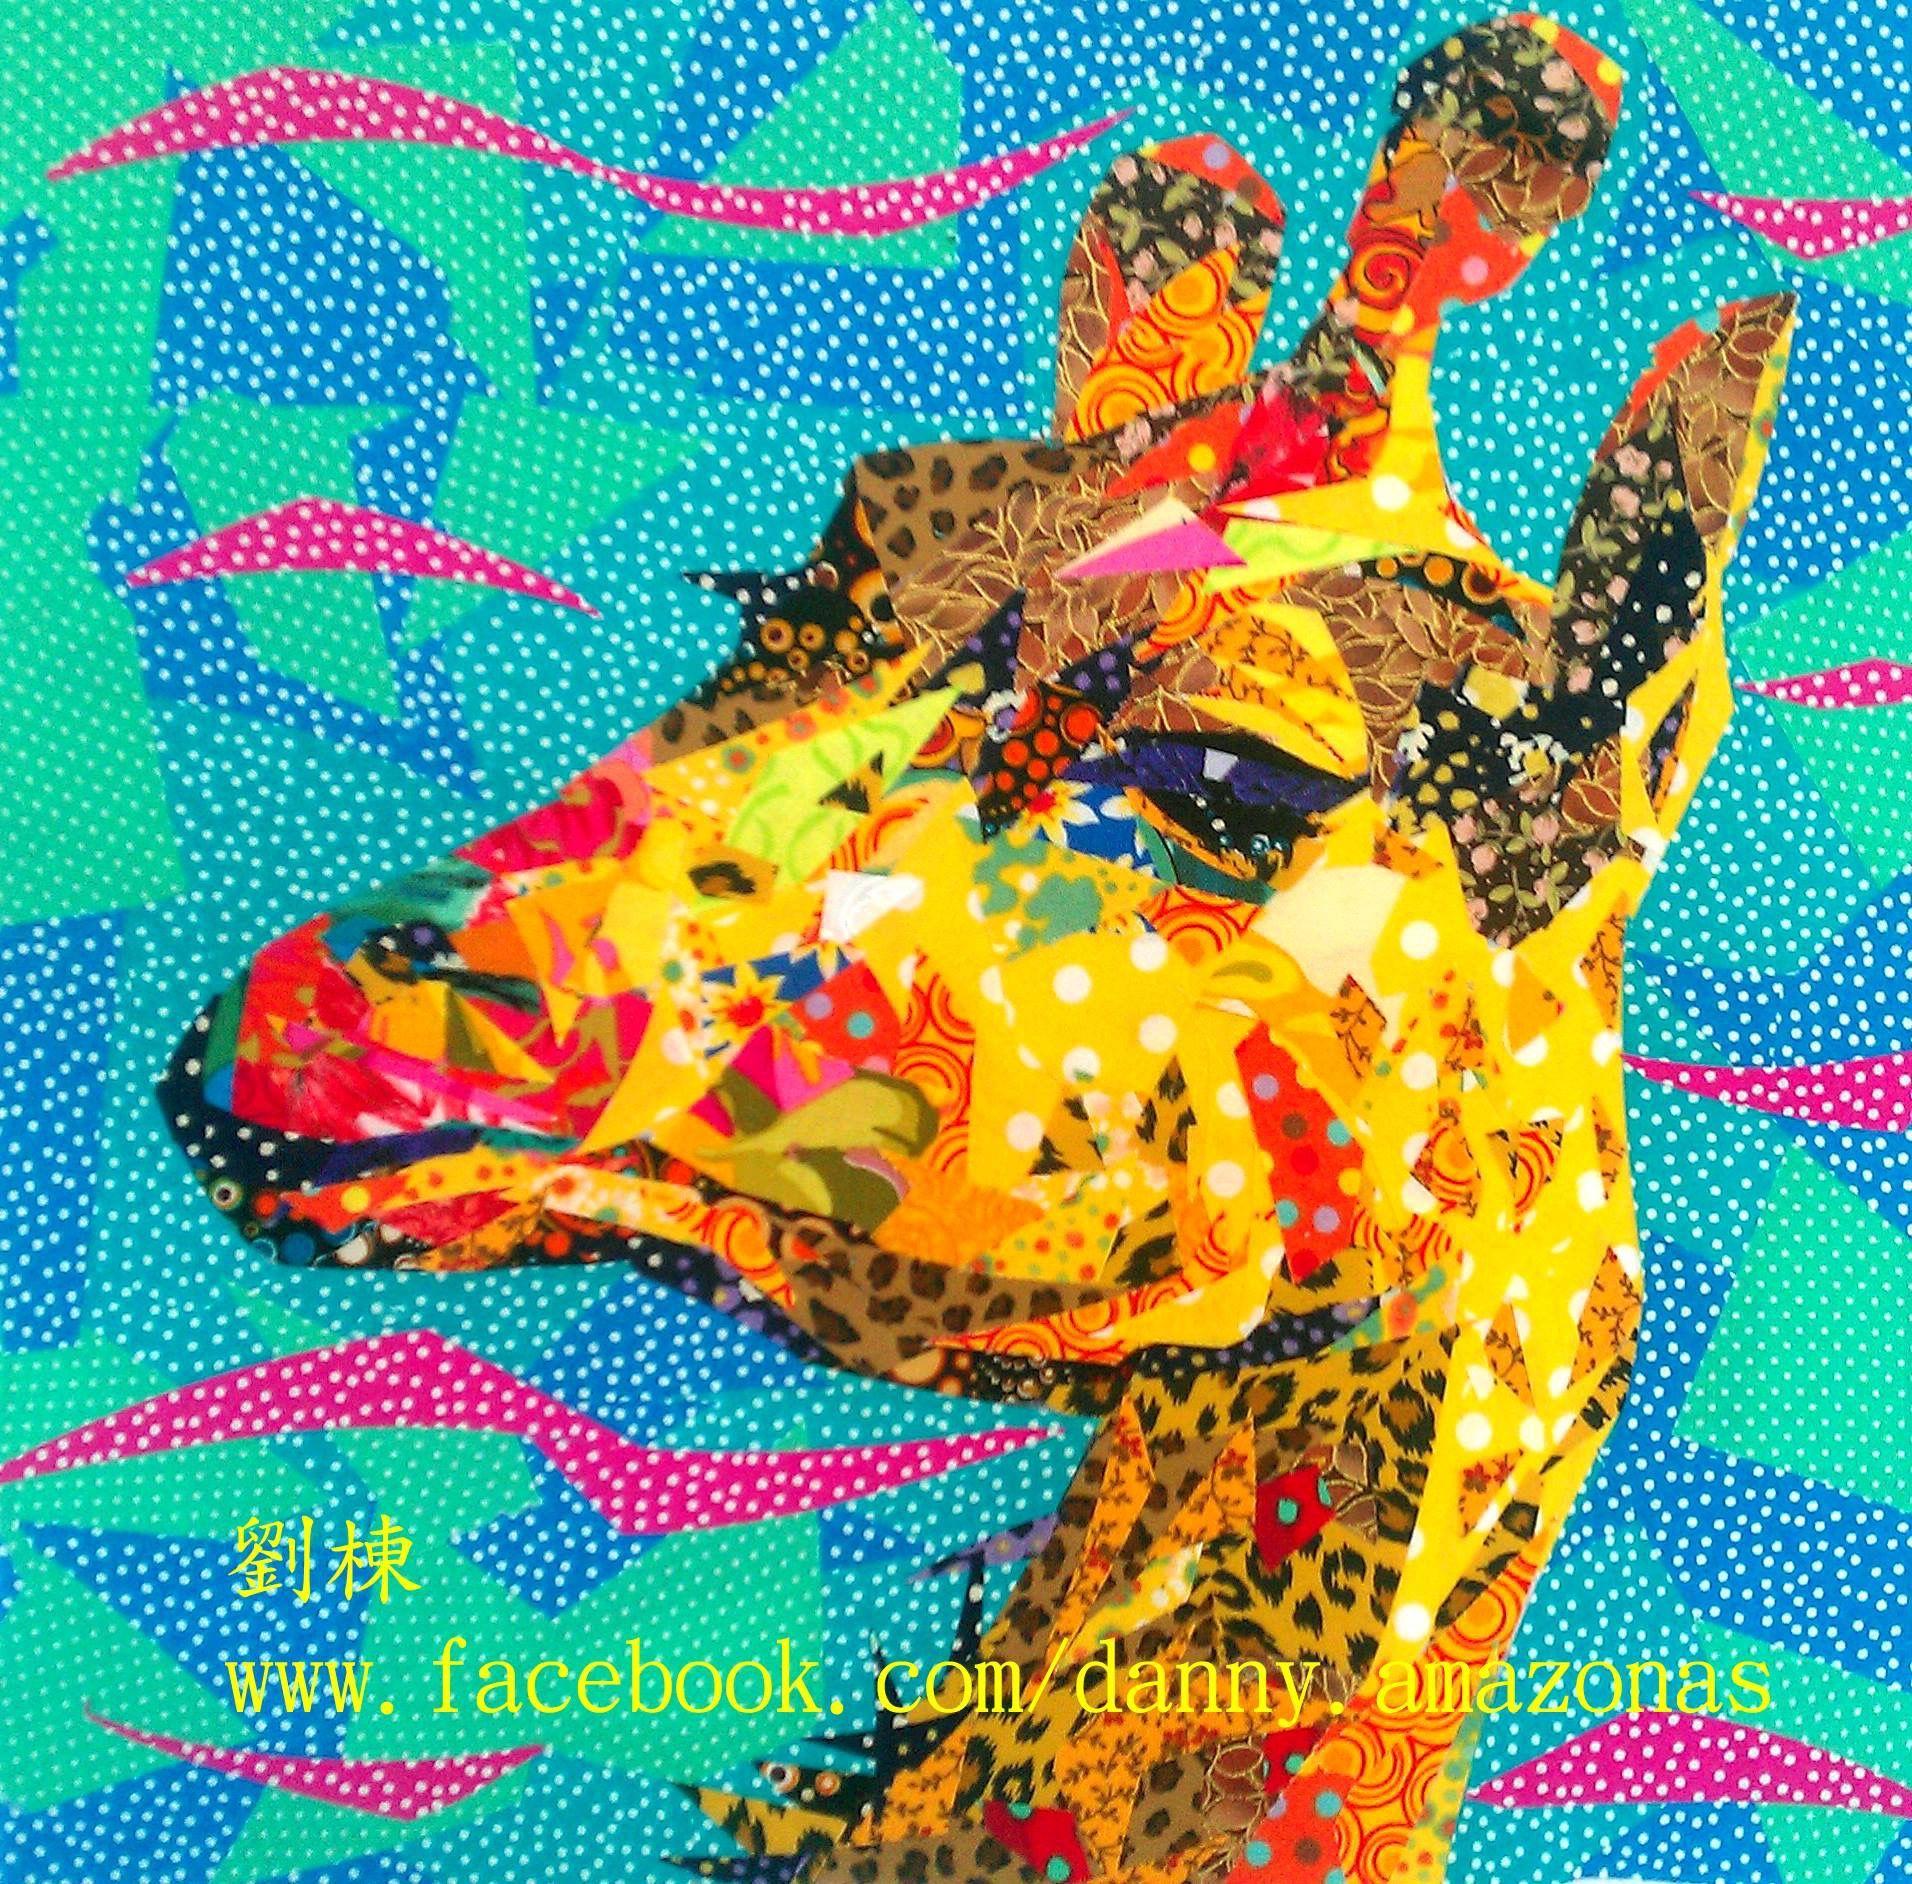 Fabric mosaic - Danny Amazonas - Facebook | Quilt Art | Pinterest ...